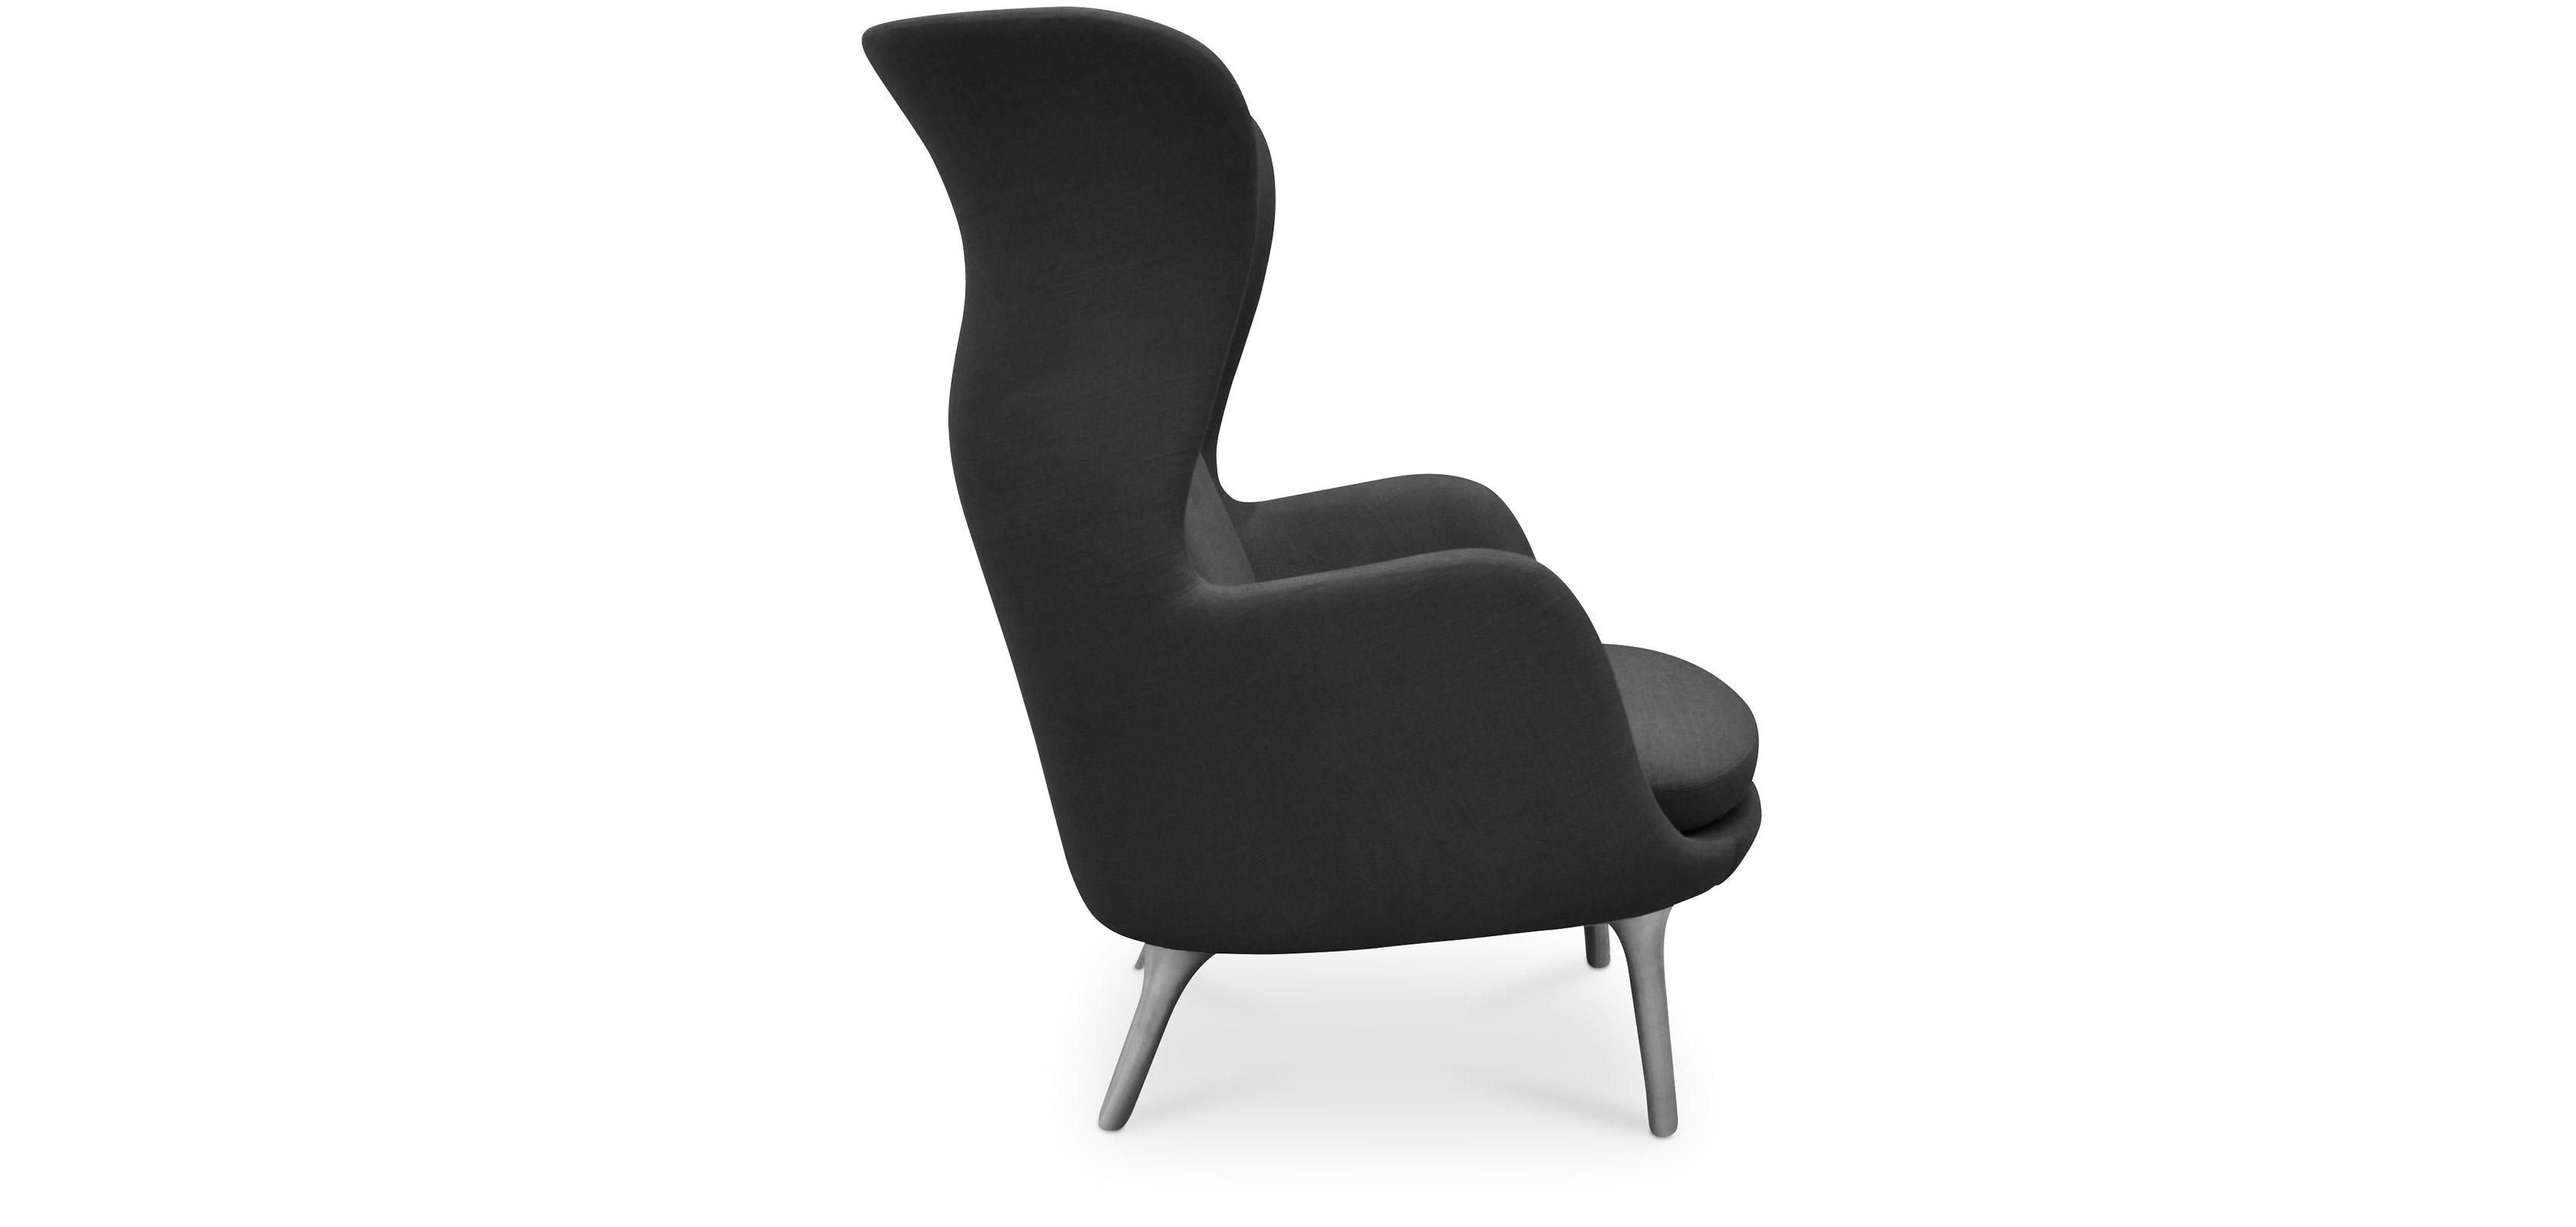 skandinavisches design ro sessel jaime hayon style stoff. Black Bedroom Furniture Sets. Home Design Ideas